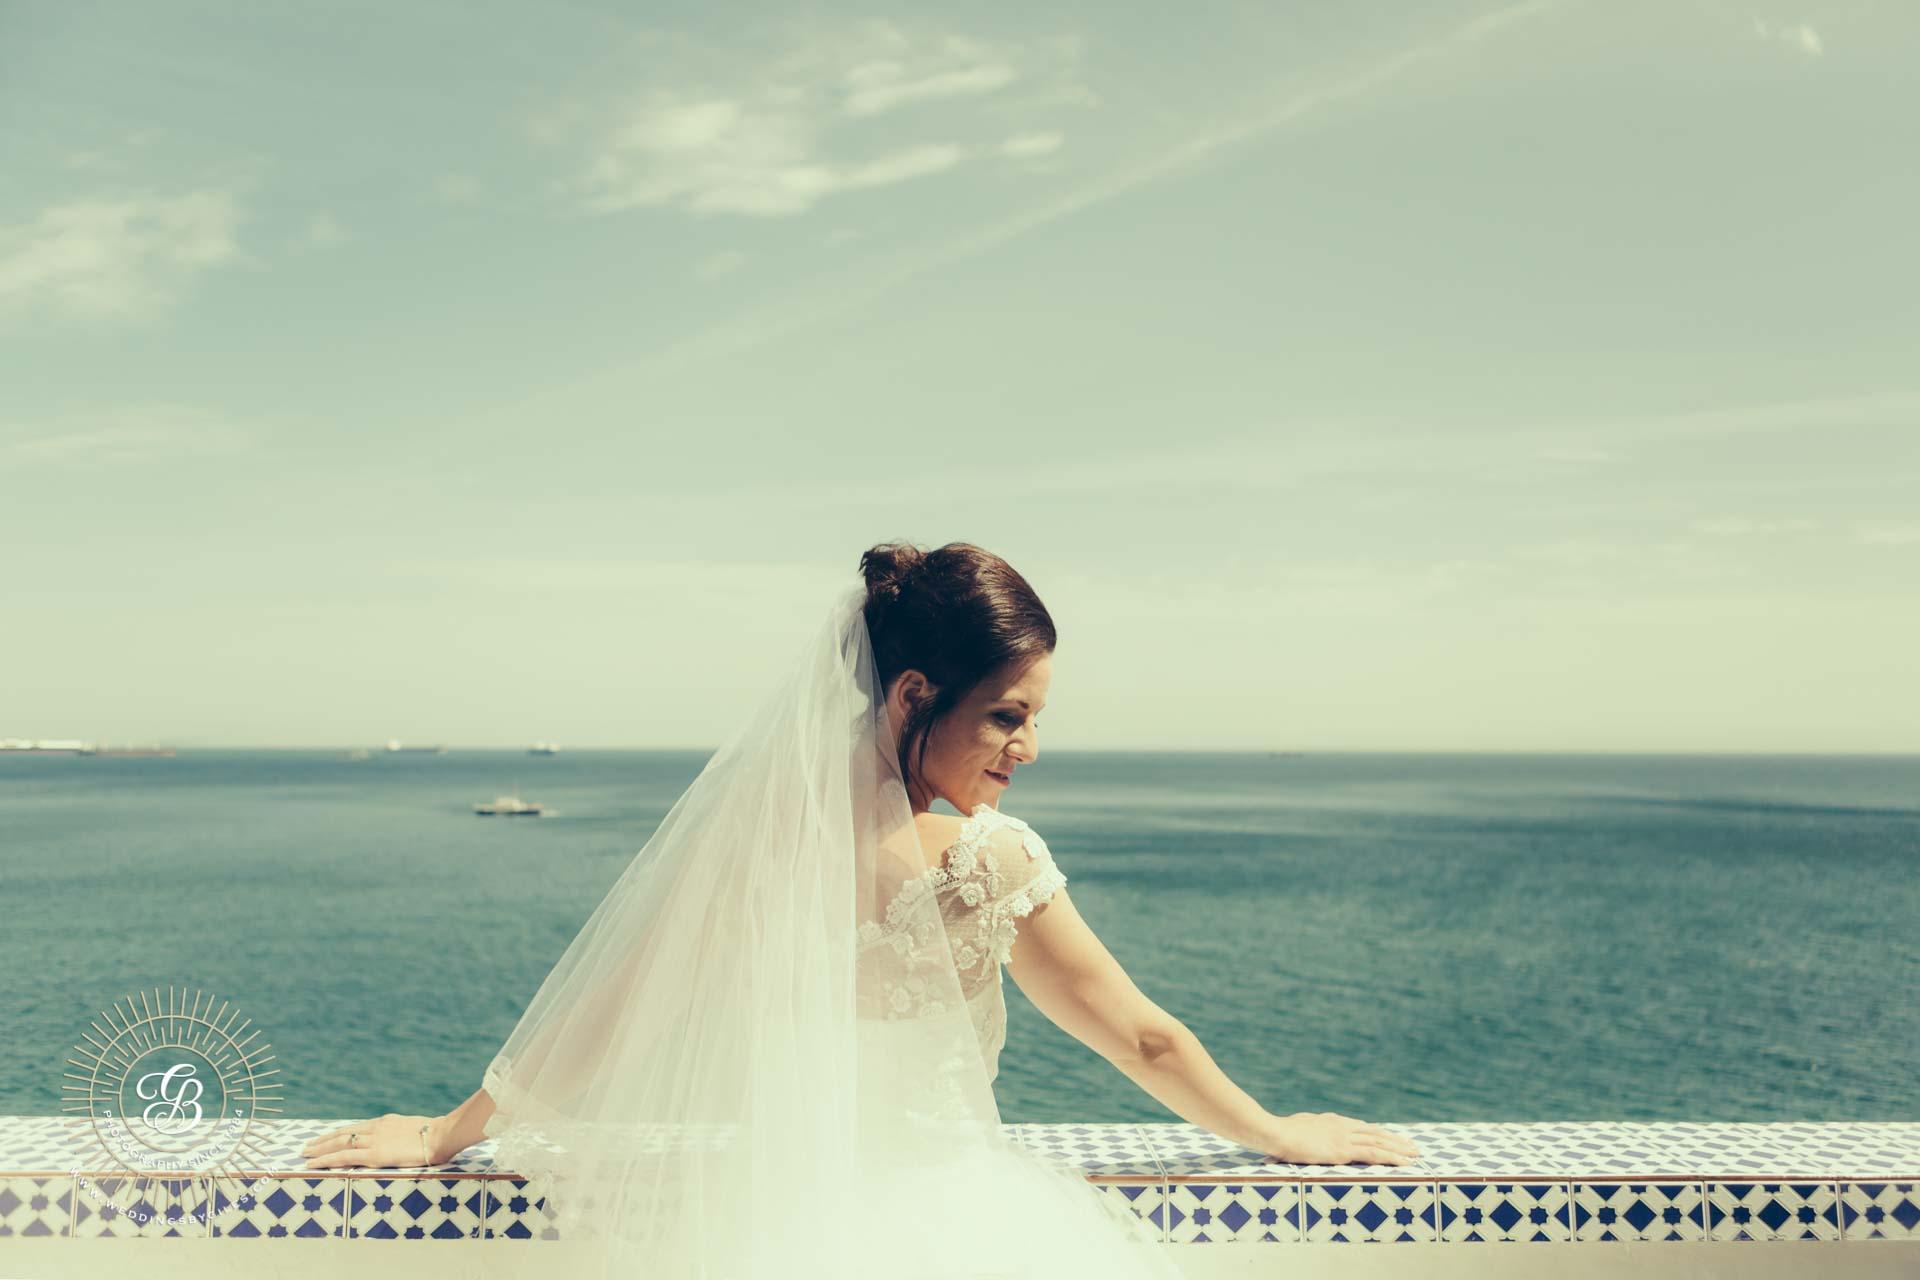 Bridal Portrait on The Calleta Hotel terrace in Gibraltar